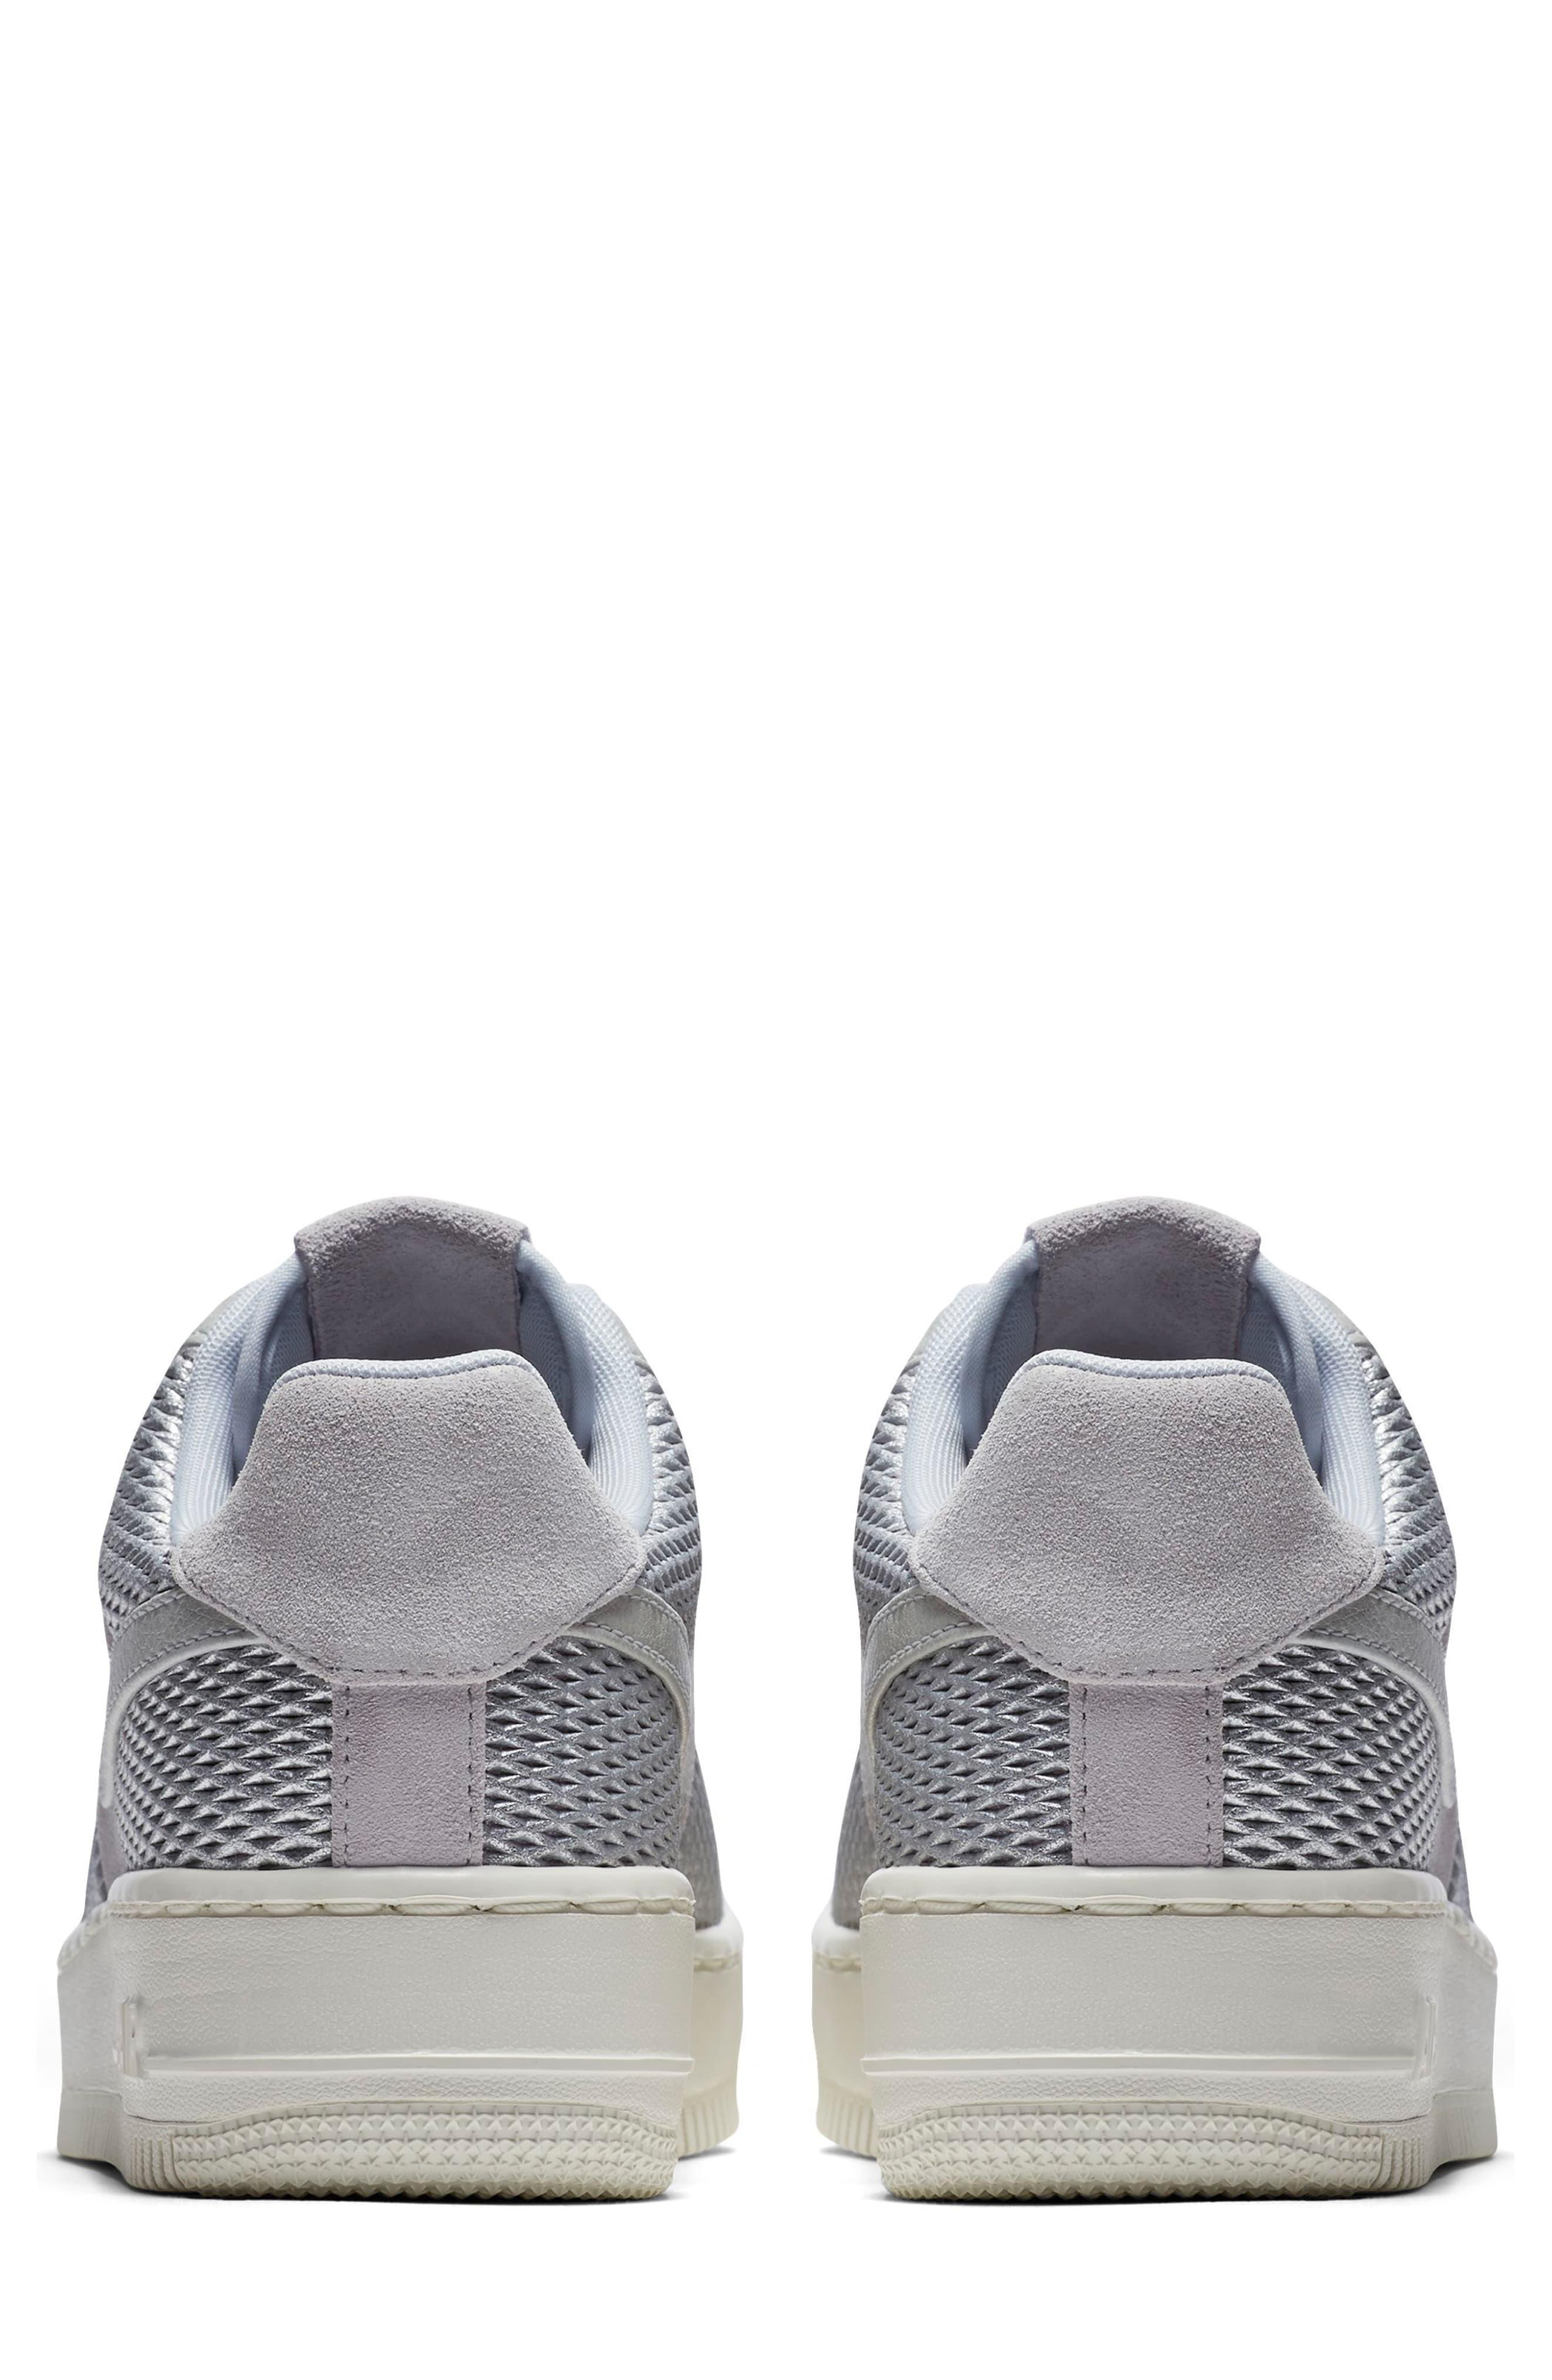 b79512f53c31c Nike Metallic Air Force 1 Upstep Premium Platform Sneaker